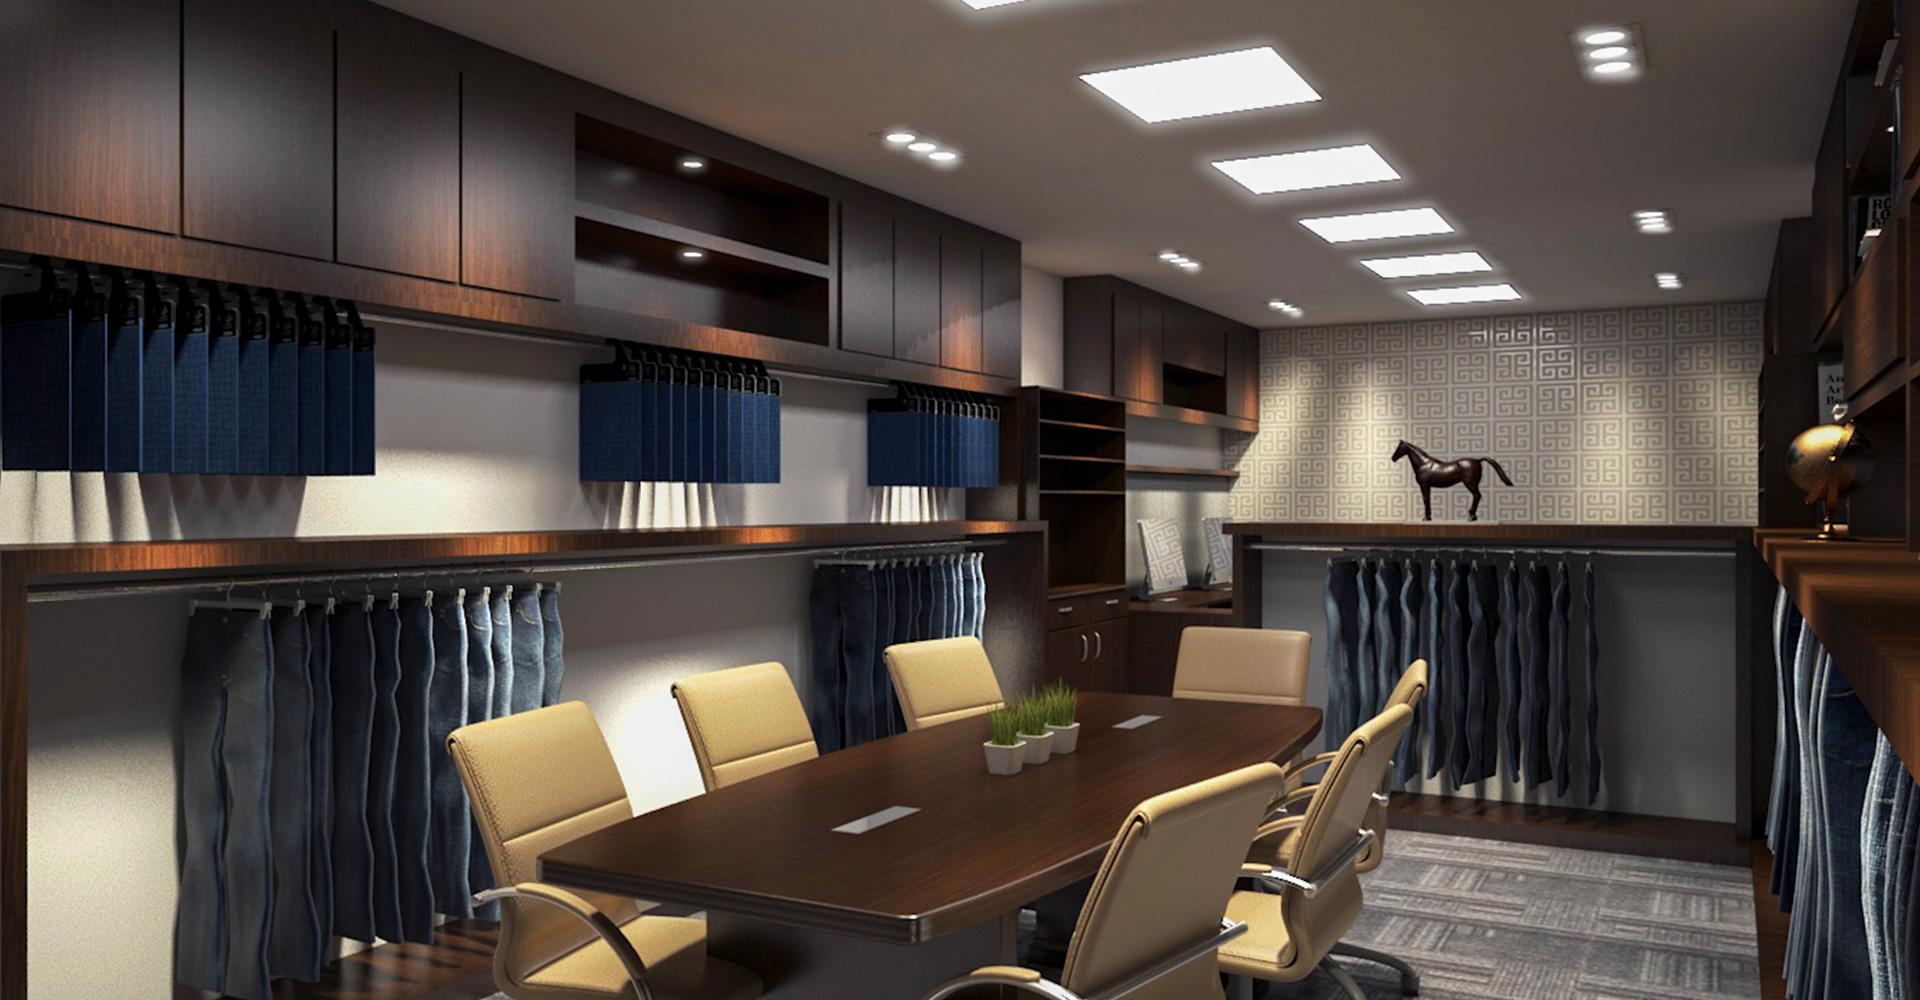 Trade-show-Interior-Design-Hiline-Lahore-portfolio-us-group-london-office-02